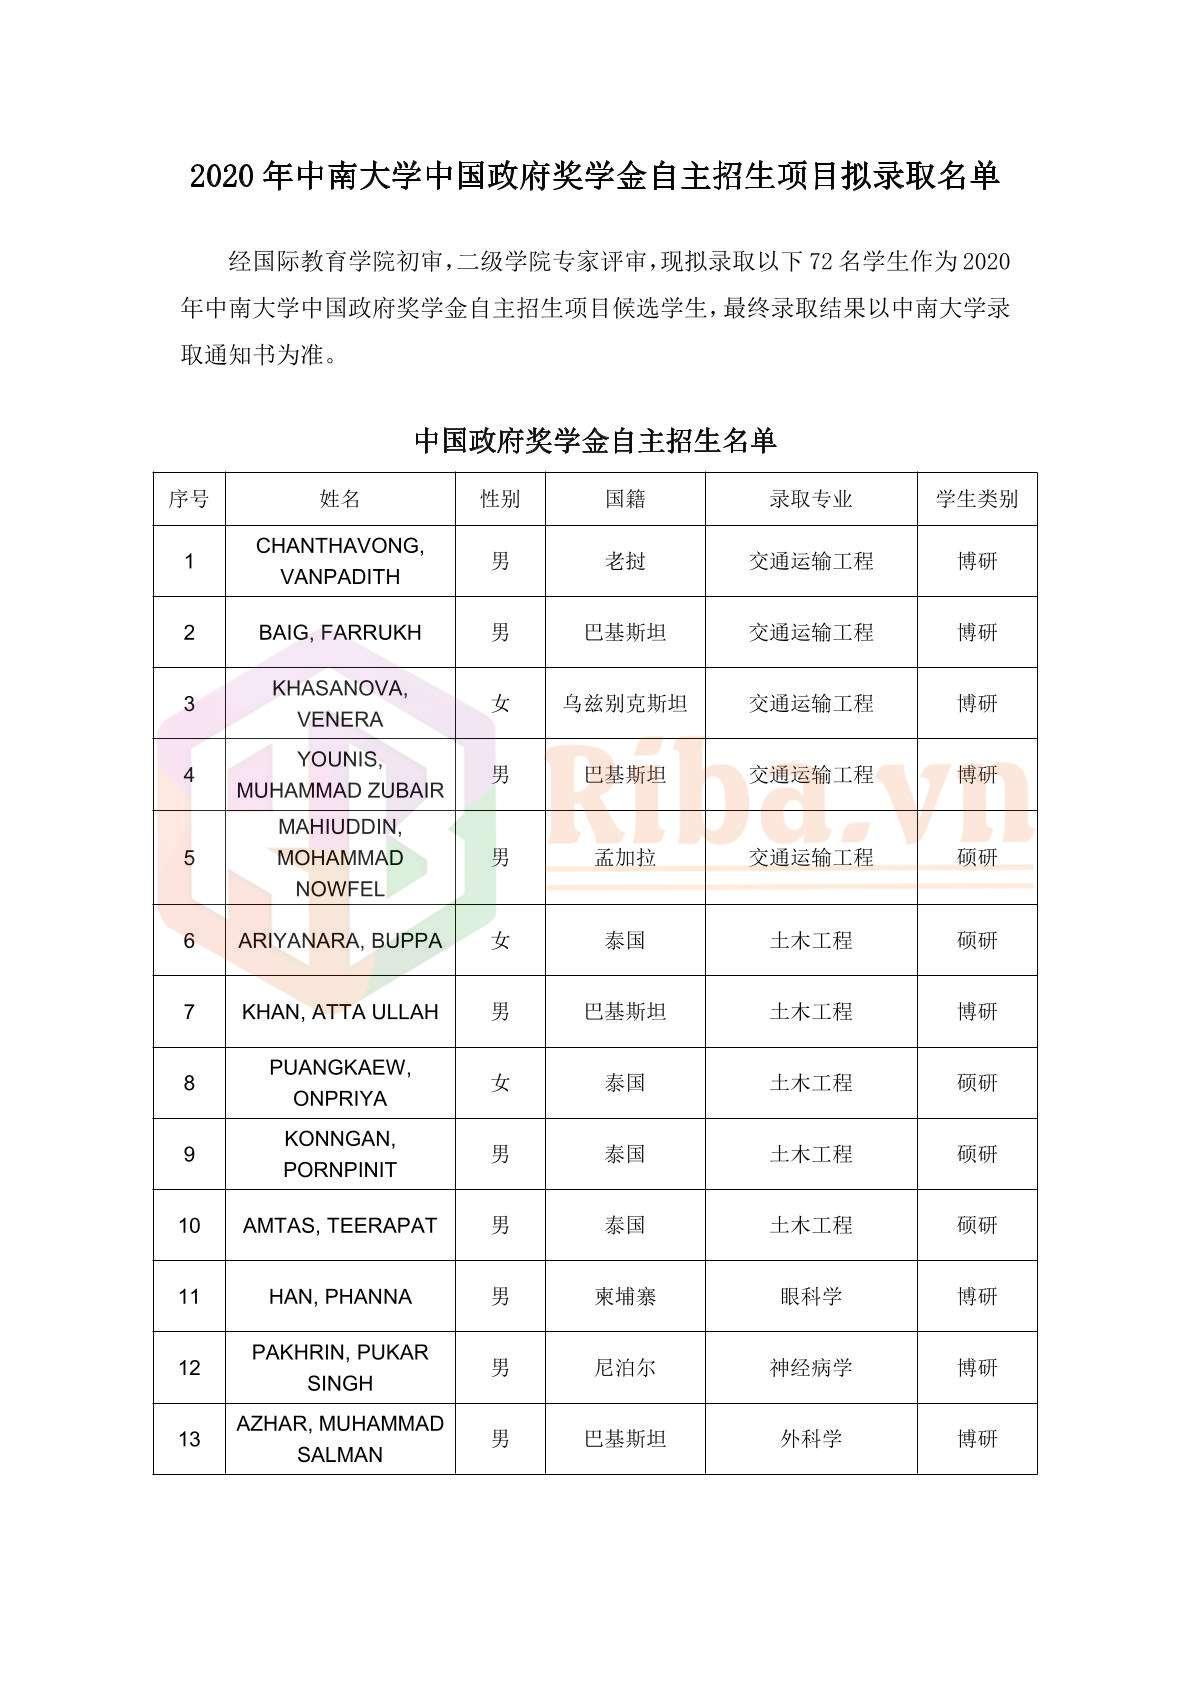 Danh Sach Do Hoc Bong Csc Dai Hoc Trung Nam 2020 01 2021